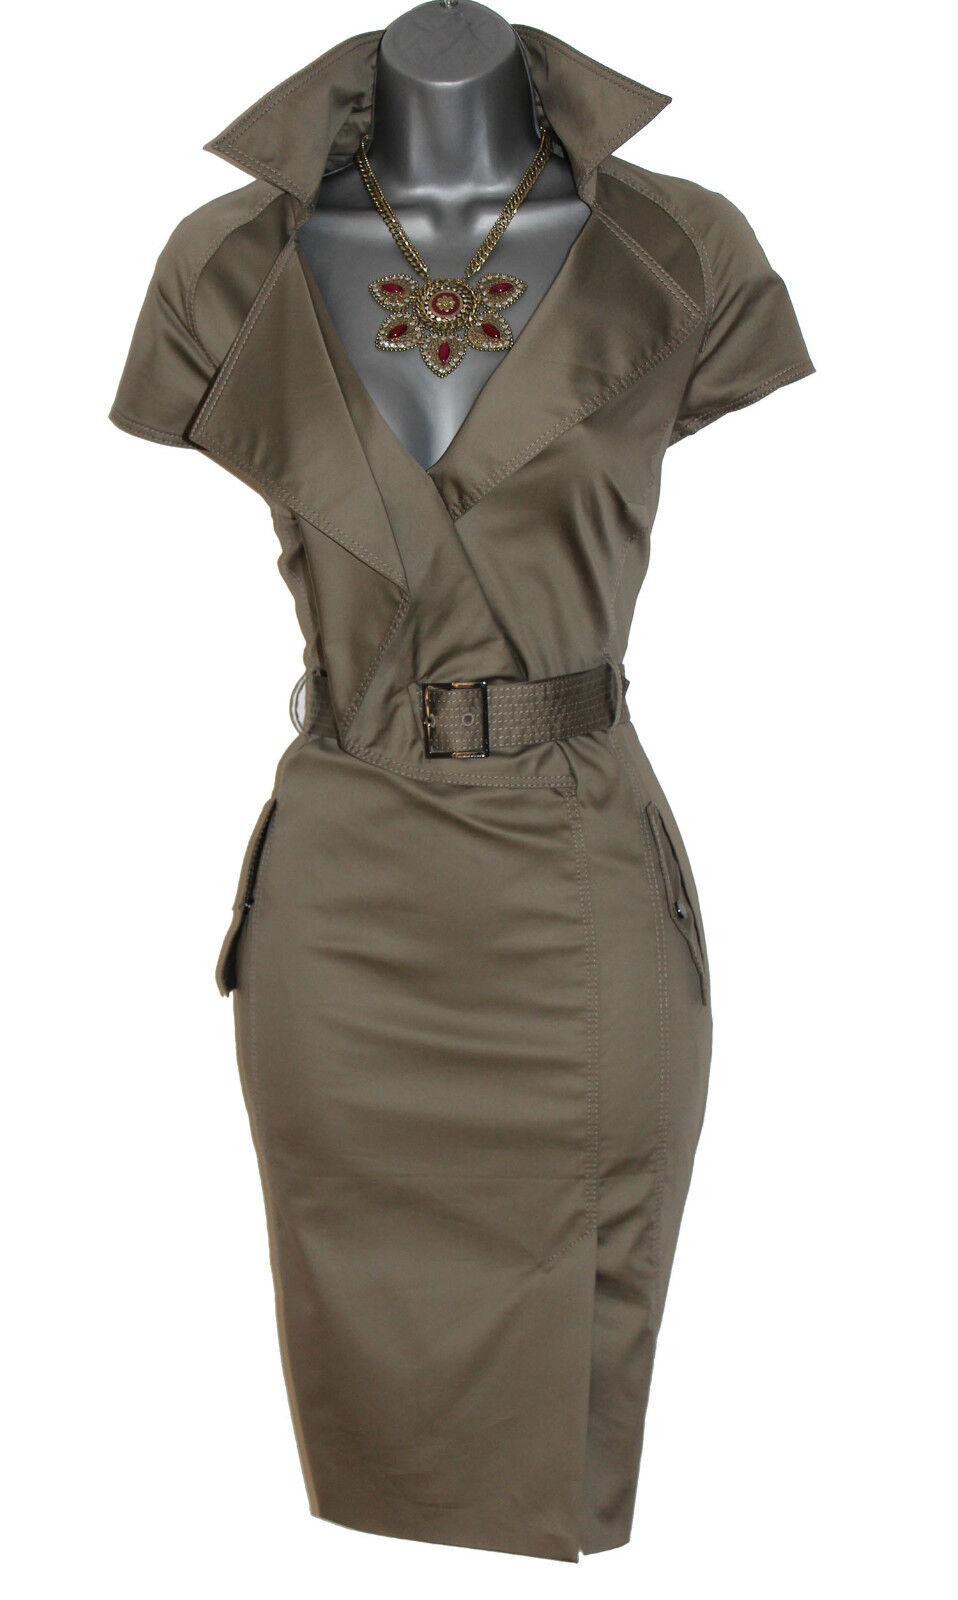 Karen Millen Khaki Military Safari Shirt Trench Office Casual Pencil Dress